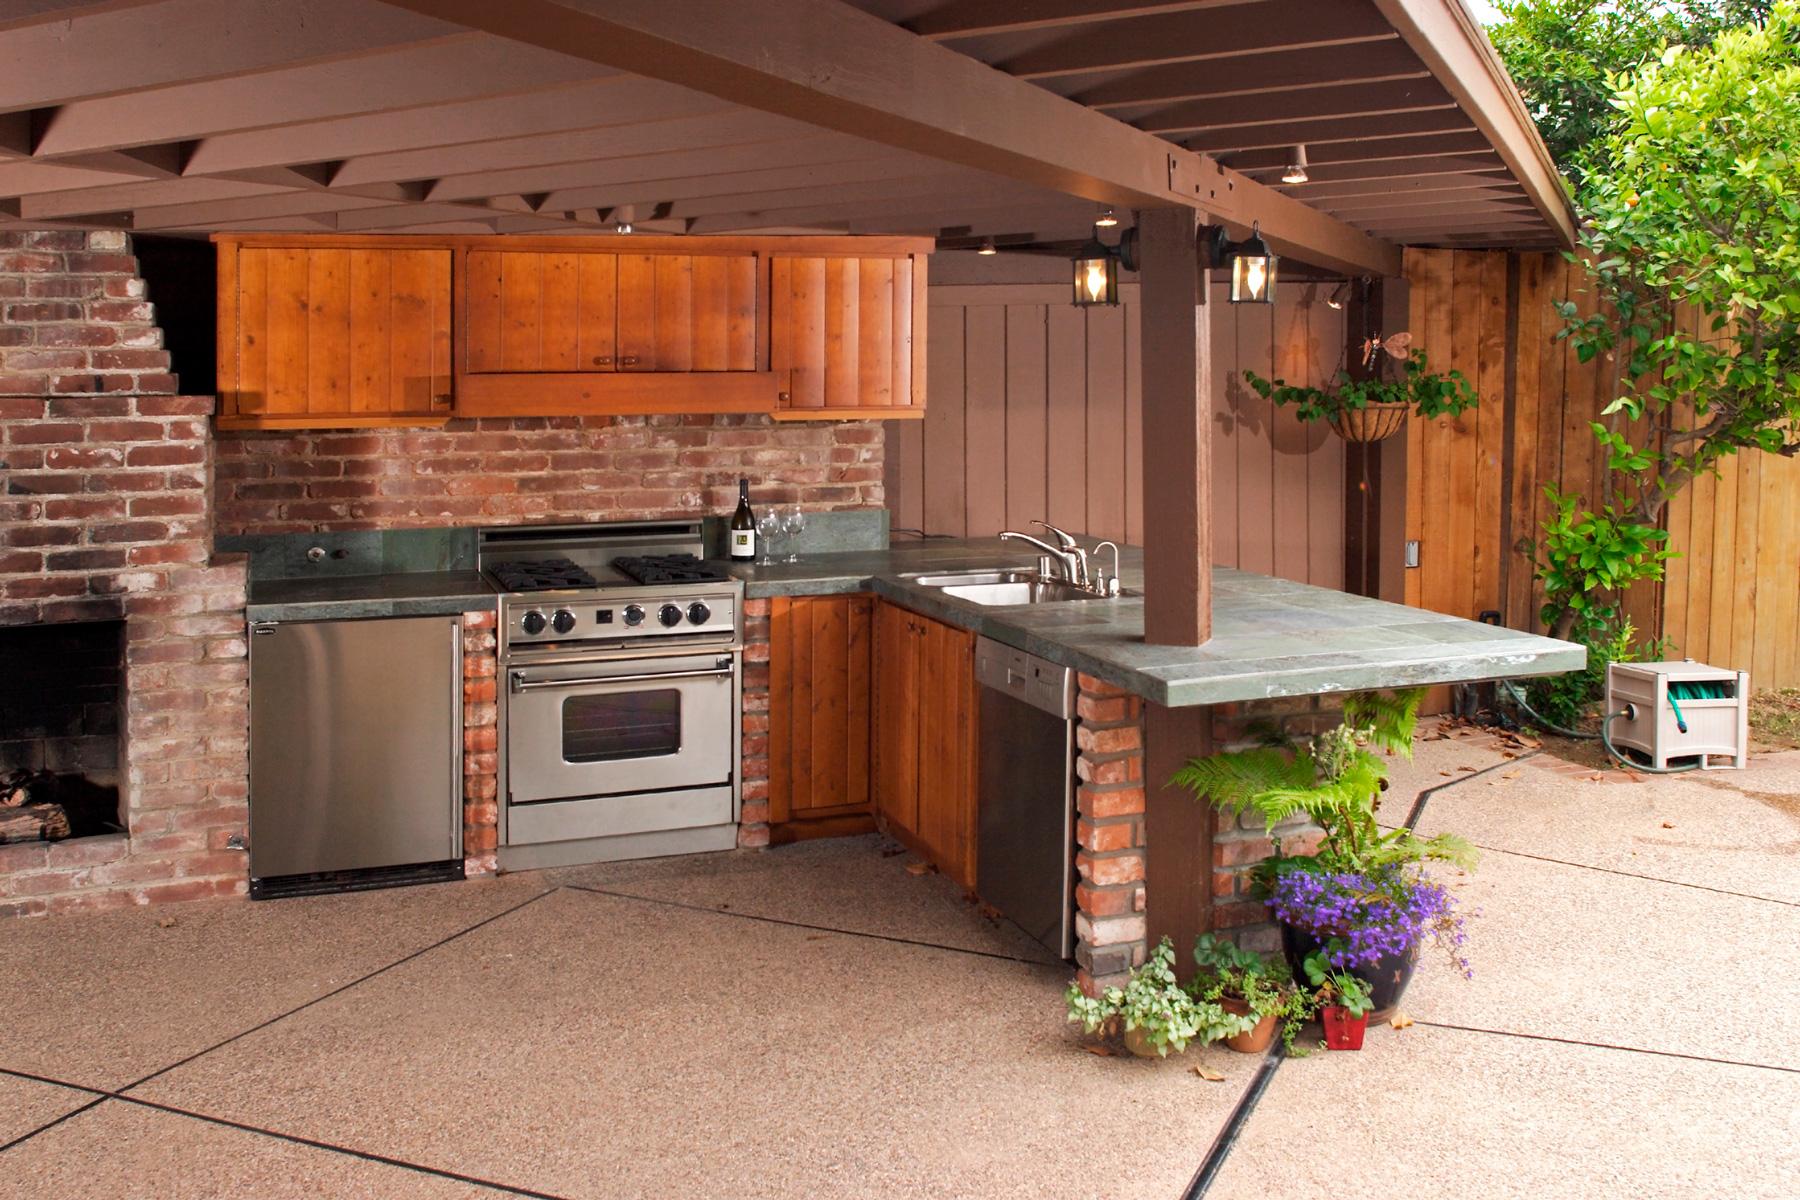 Летняя кухня для дачи своими руками